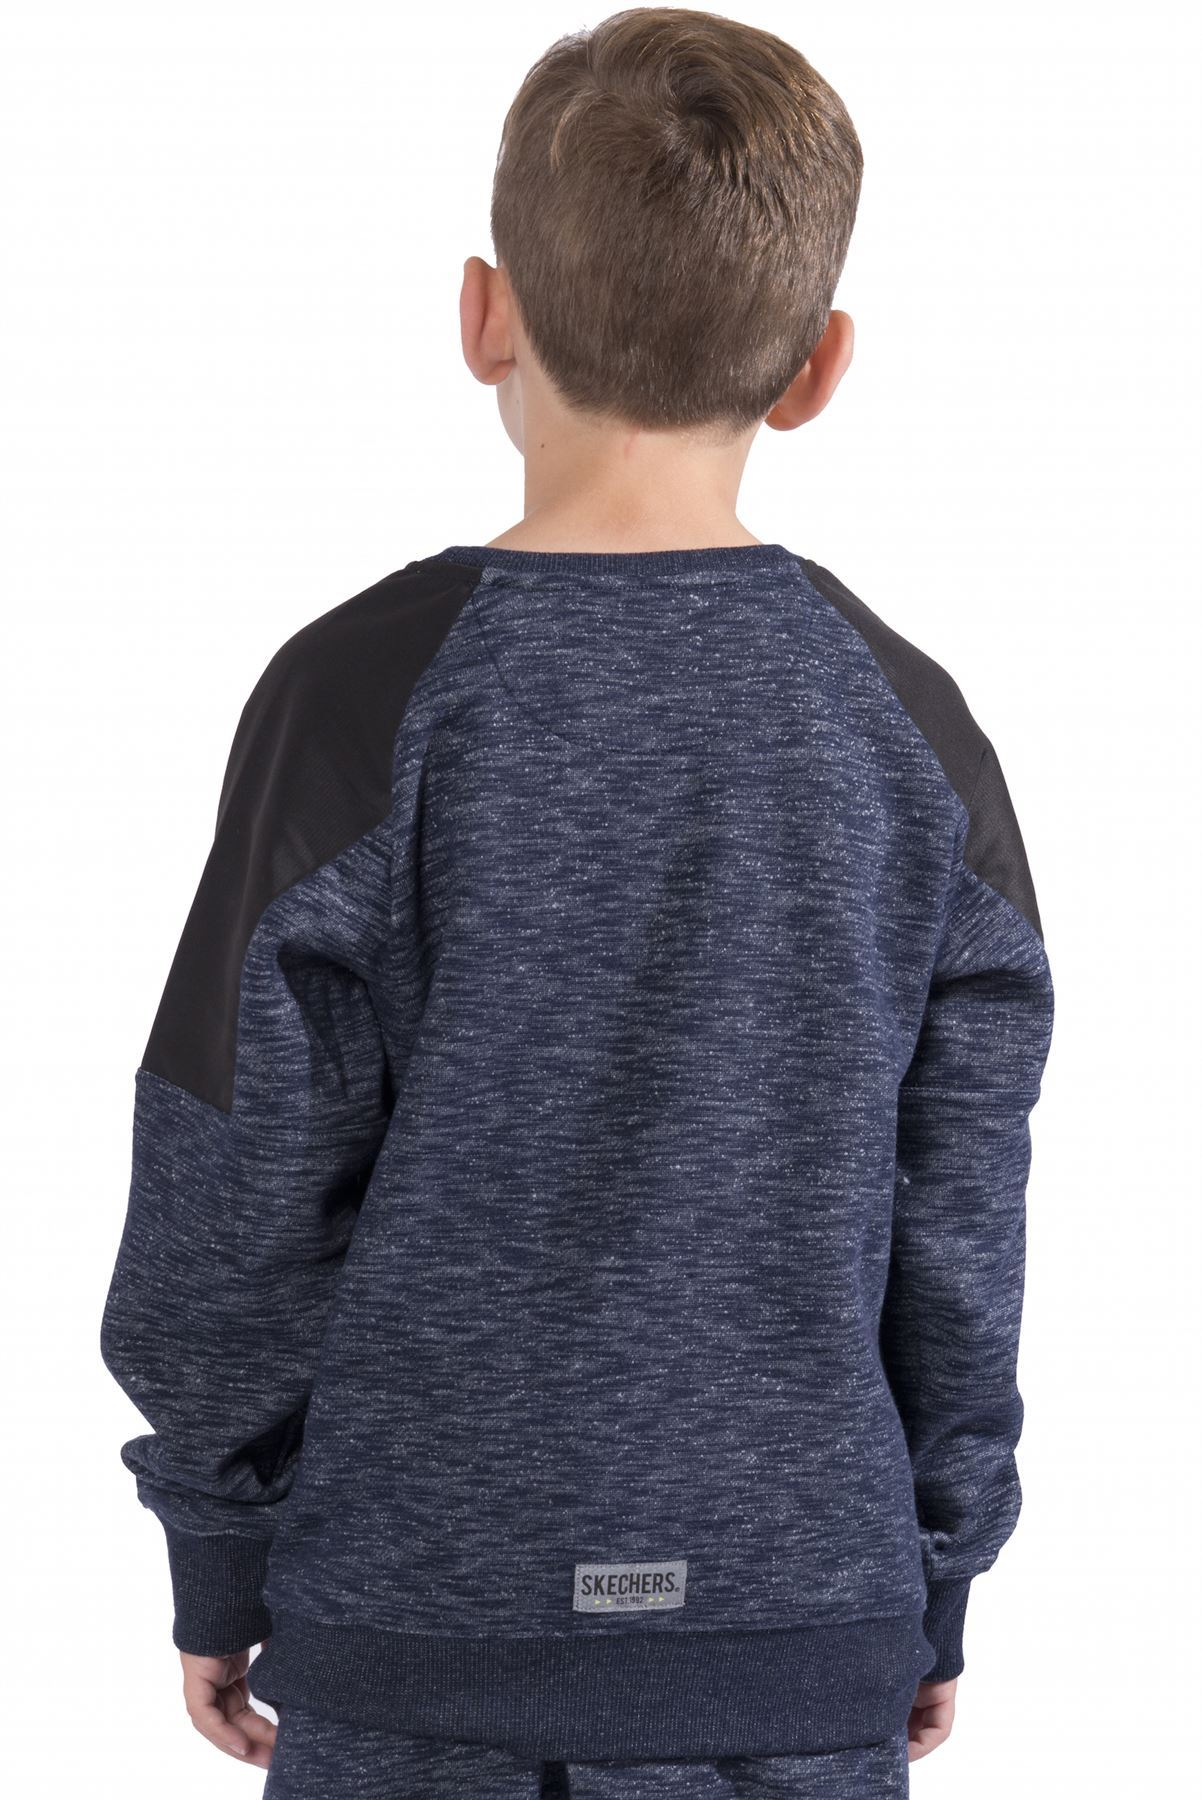 f948fb0b7 skechers sweatshirts kids price cheap   OFF76% The Largest Catalog ...